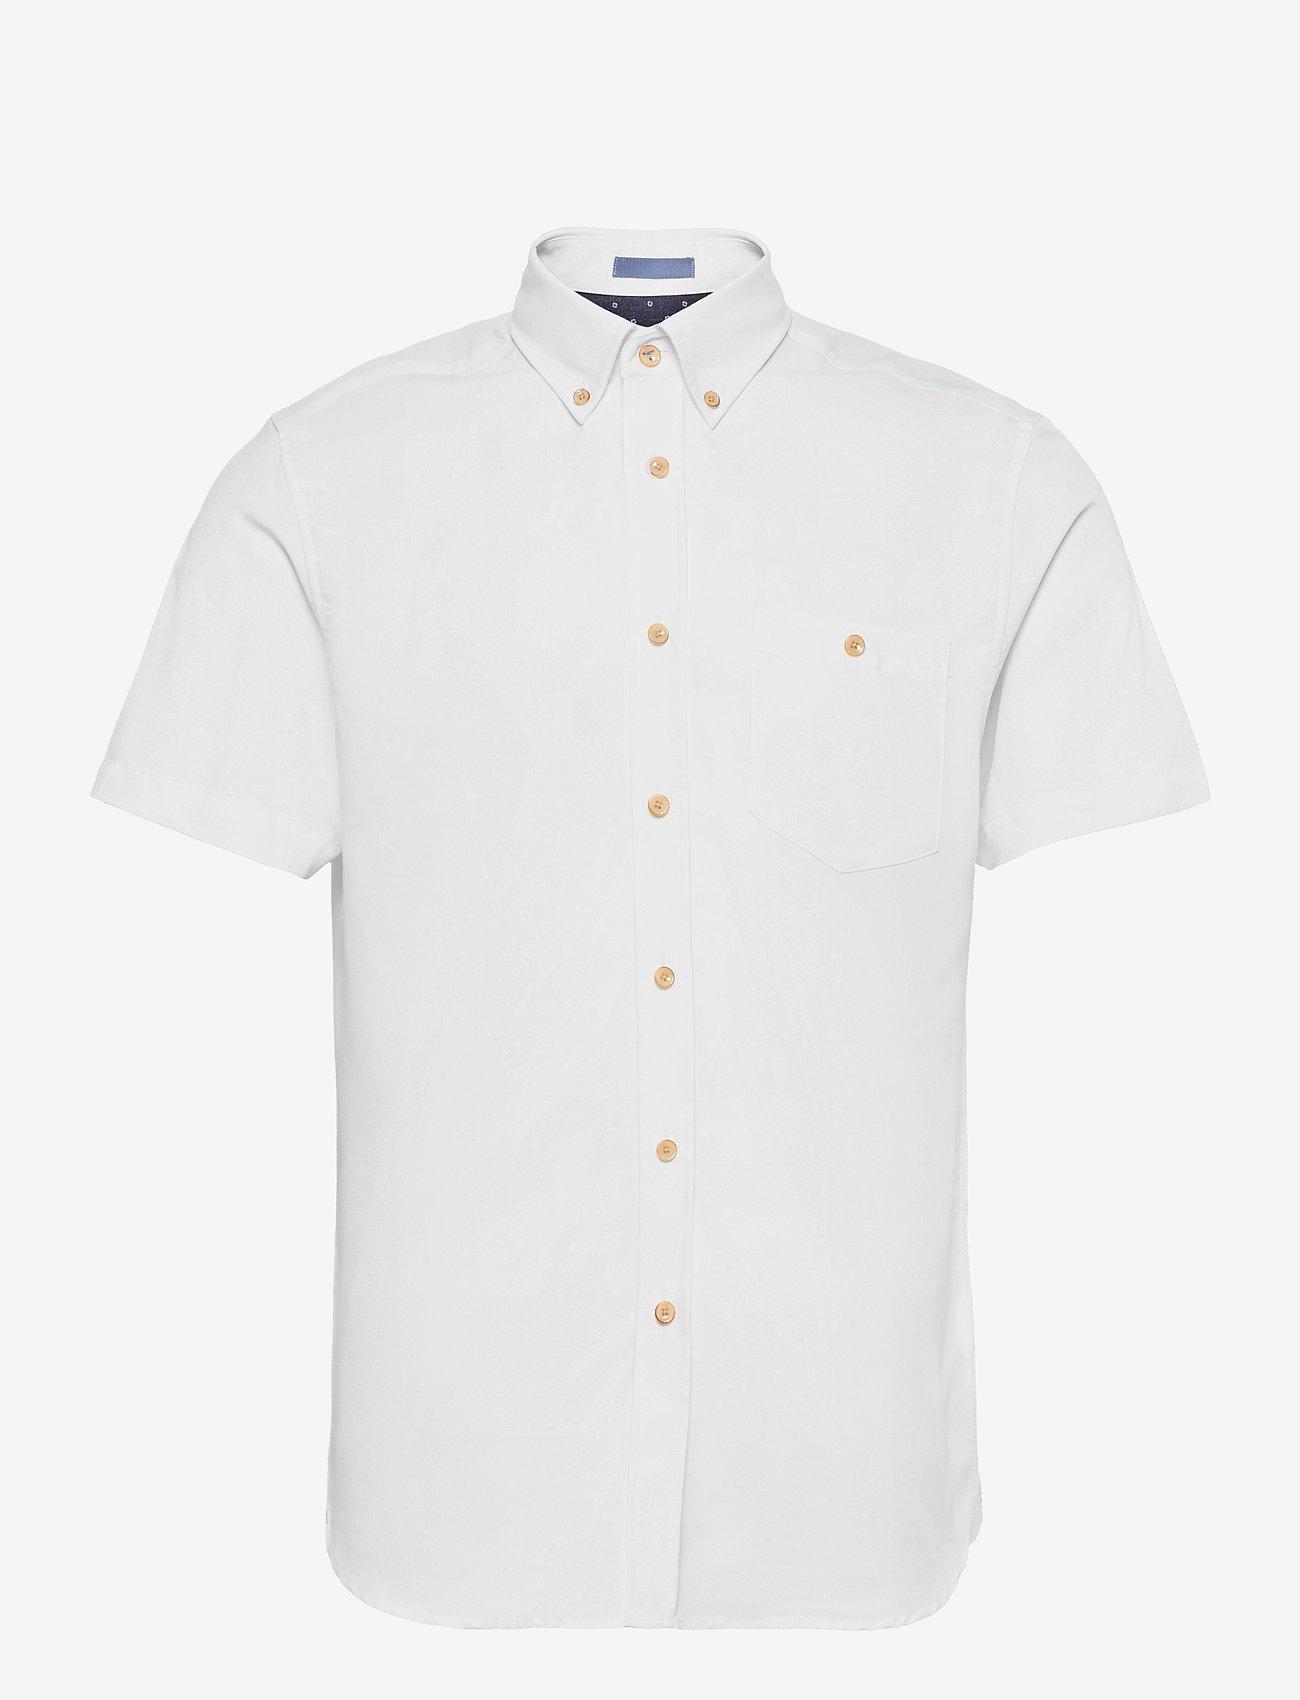 Ted Baker - YASAI - geruite overhemden - white - 0